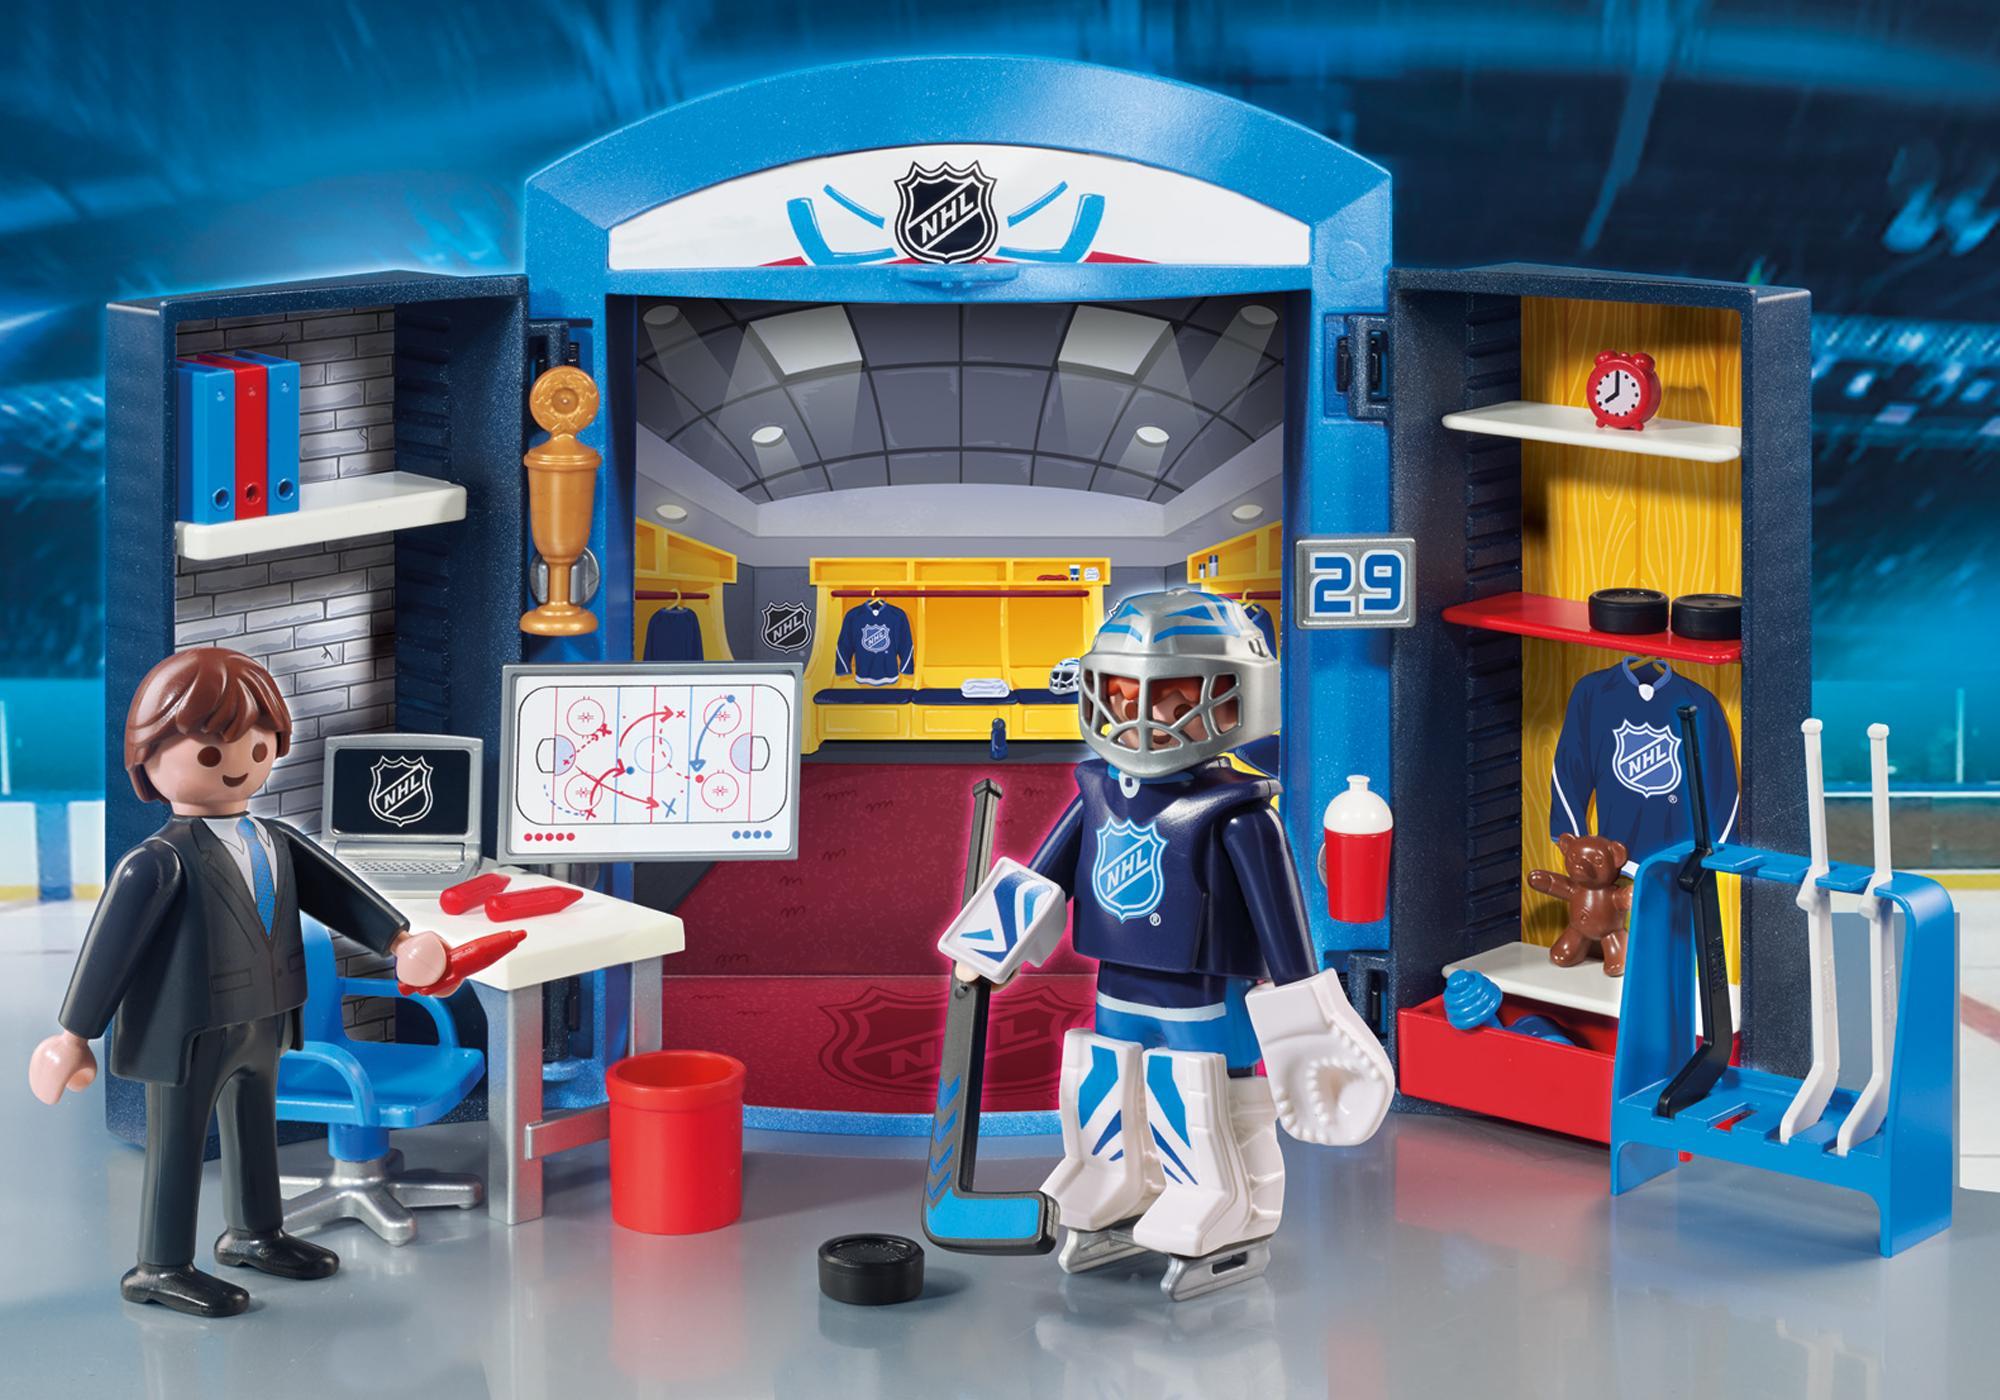 http://media.playmobil.com/i/playmobil/9176_product_detail/NHL™ Locker Room Play Box